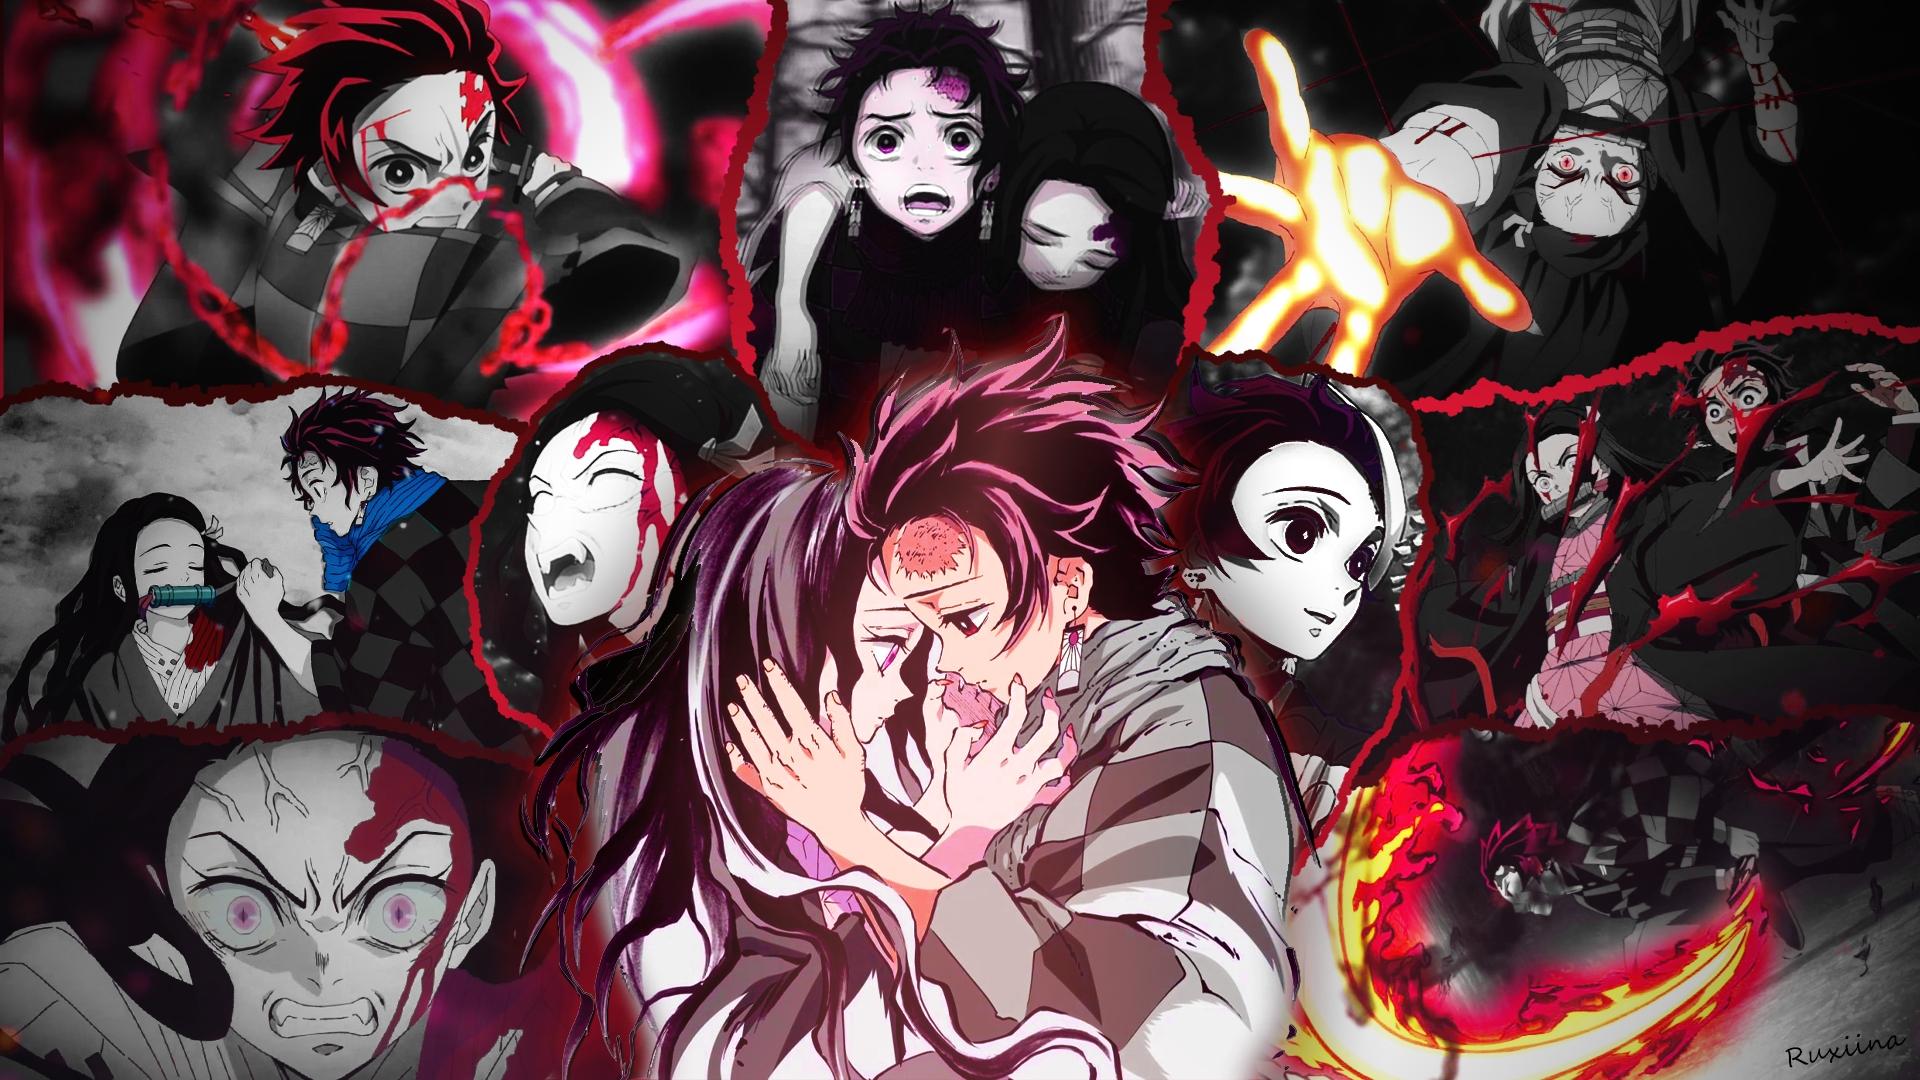 Demon Slayer Kimetsu No Yaiba Wallpaper Posted By Christopher